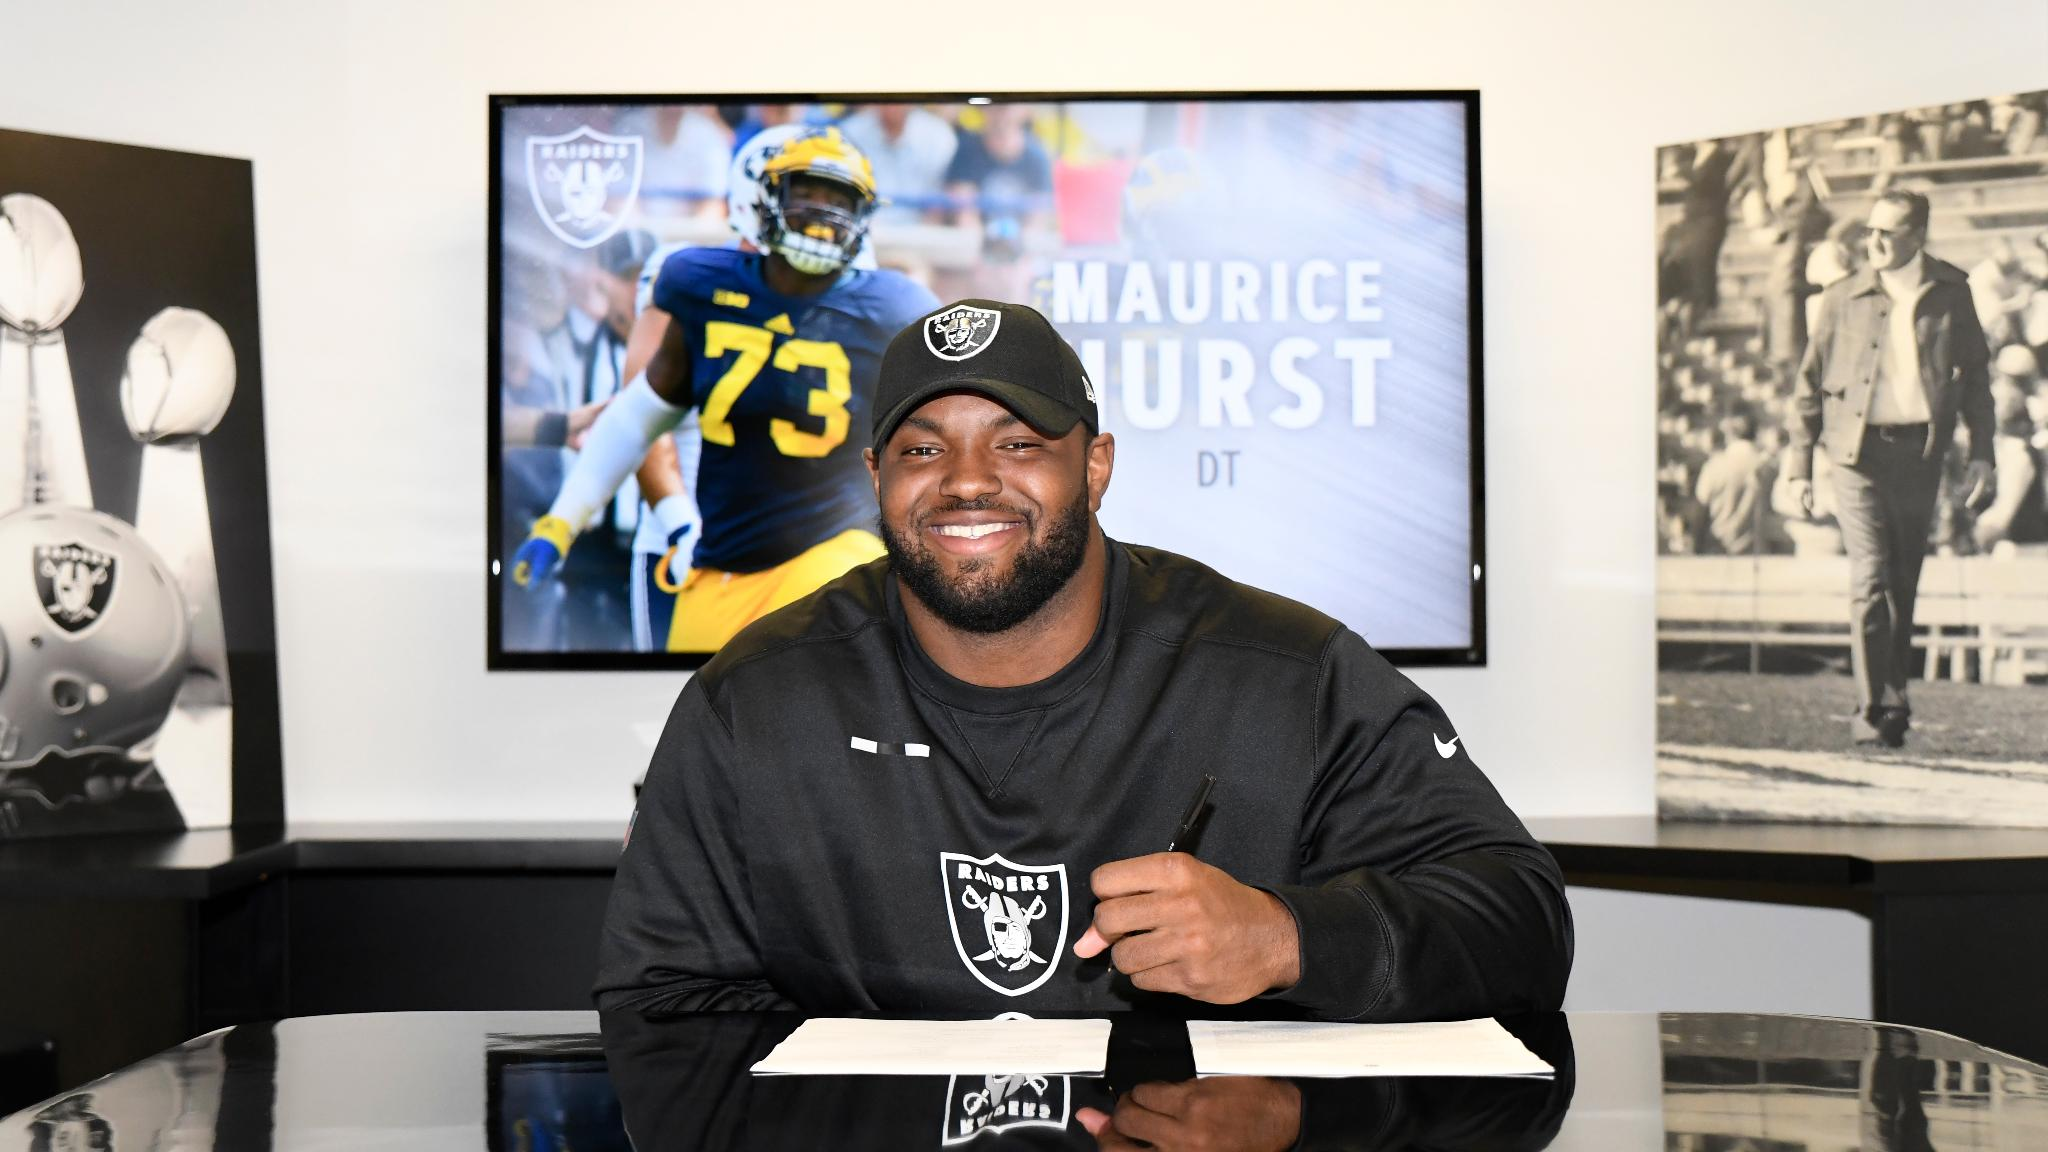 The Raiders have signed fifth-round pick @mohurstjr.  More: https://t.co/urCkdXJkSz #RaiderNation �� https://t.co/iK0BYItM6L